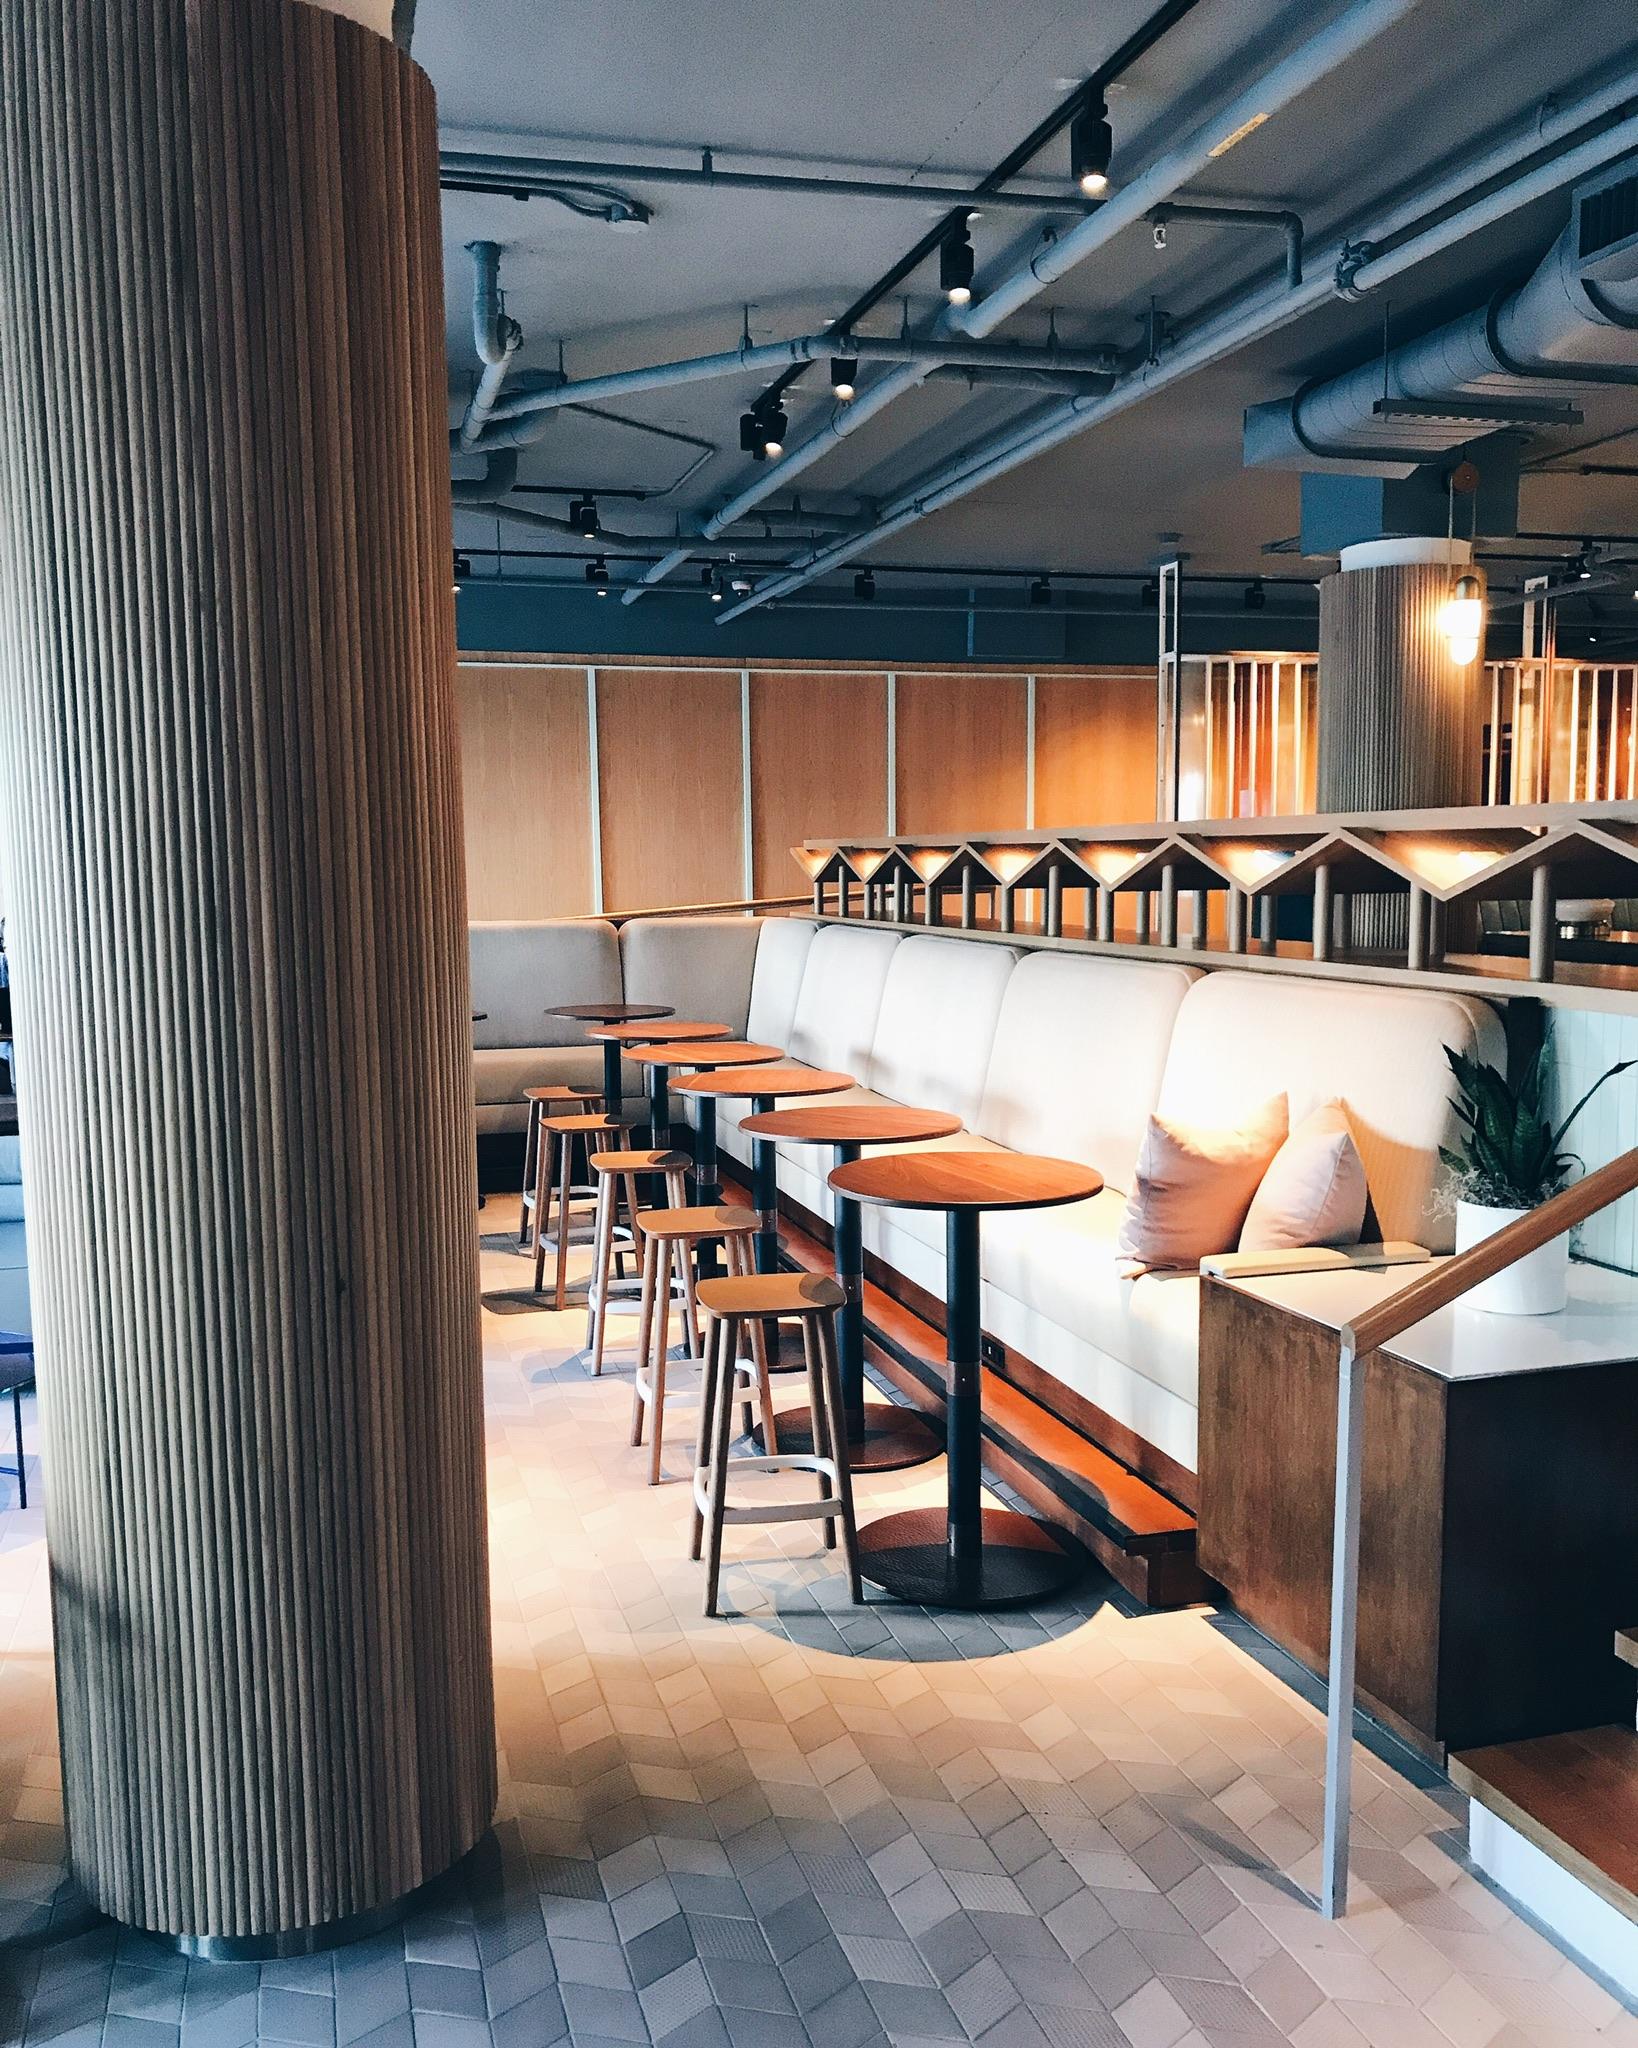 the gates hotel miami review, life with aco, miami beach hotel